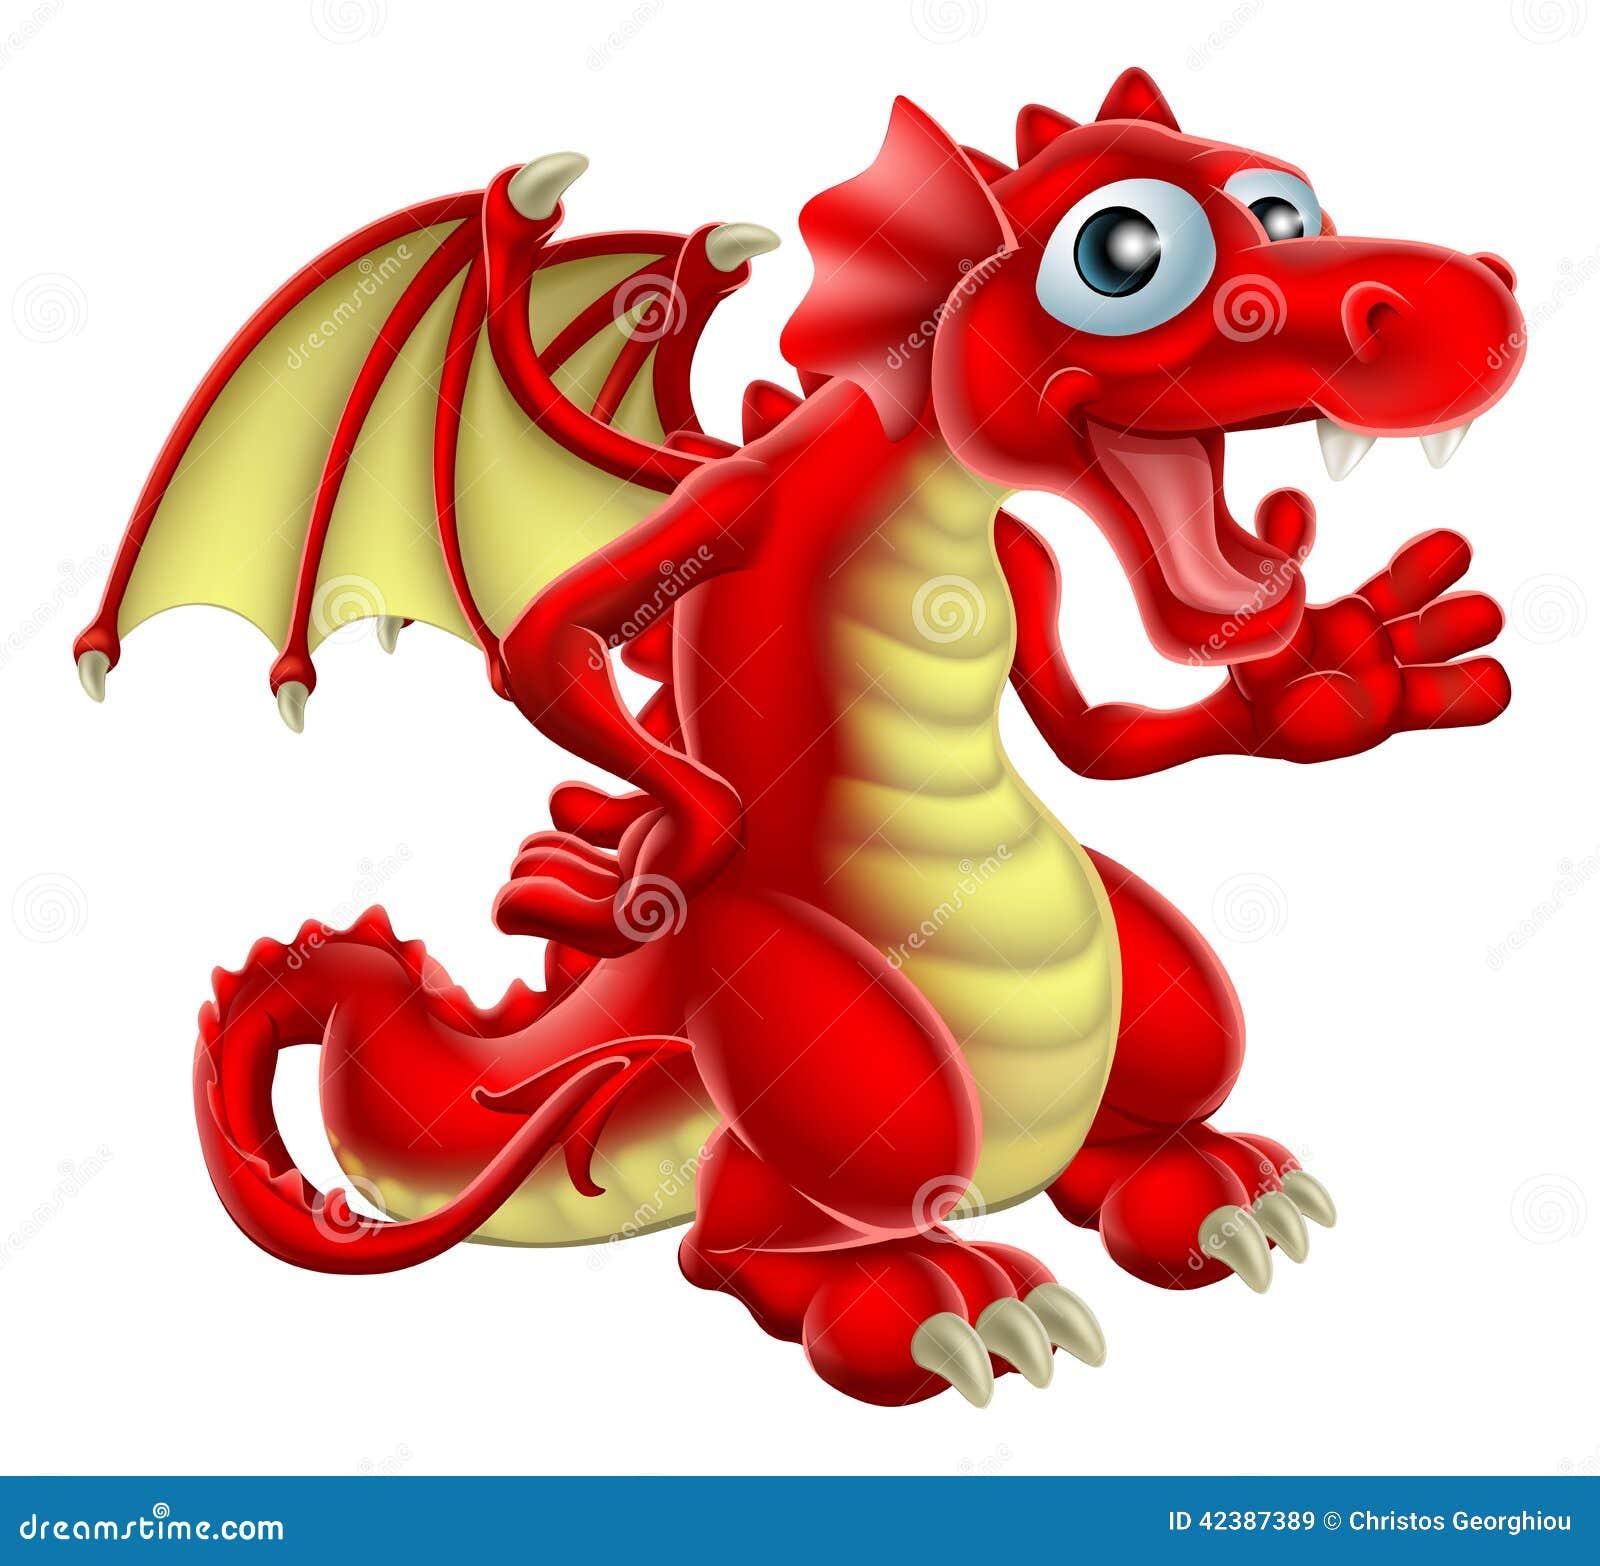 Cartoon Red Dragon Stock Vector - Image: 42387389